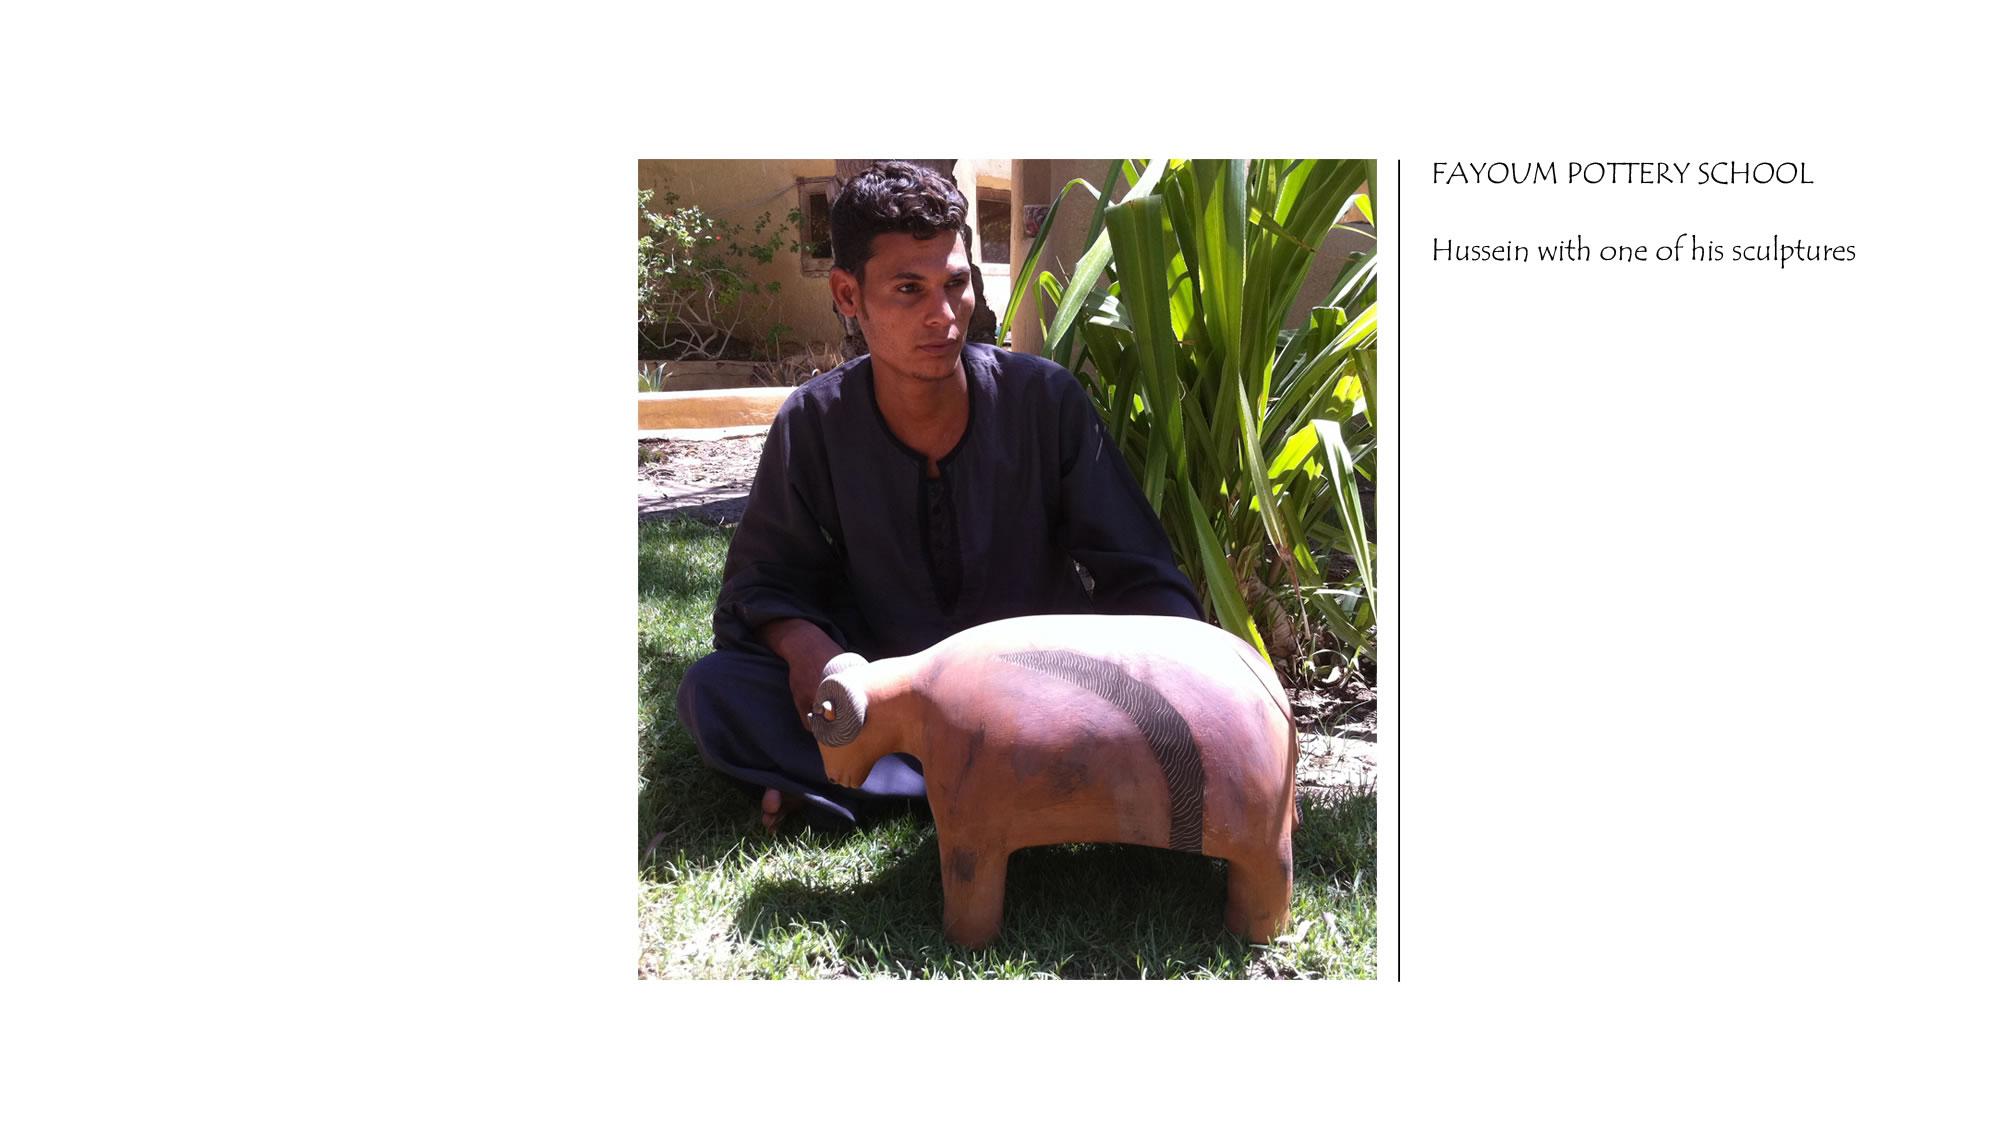 fayoum-pottery-school-13.jpg